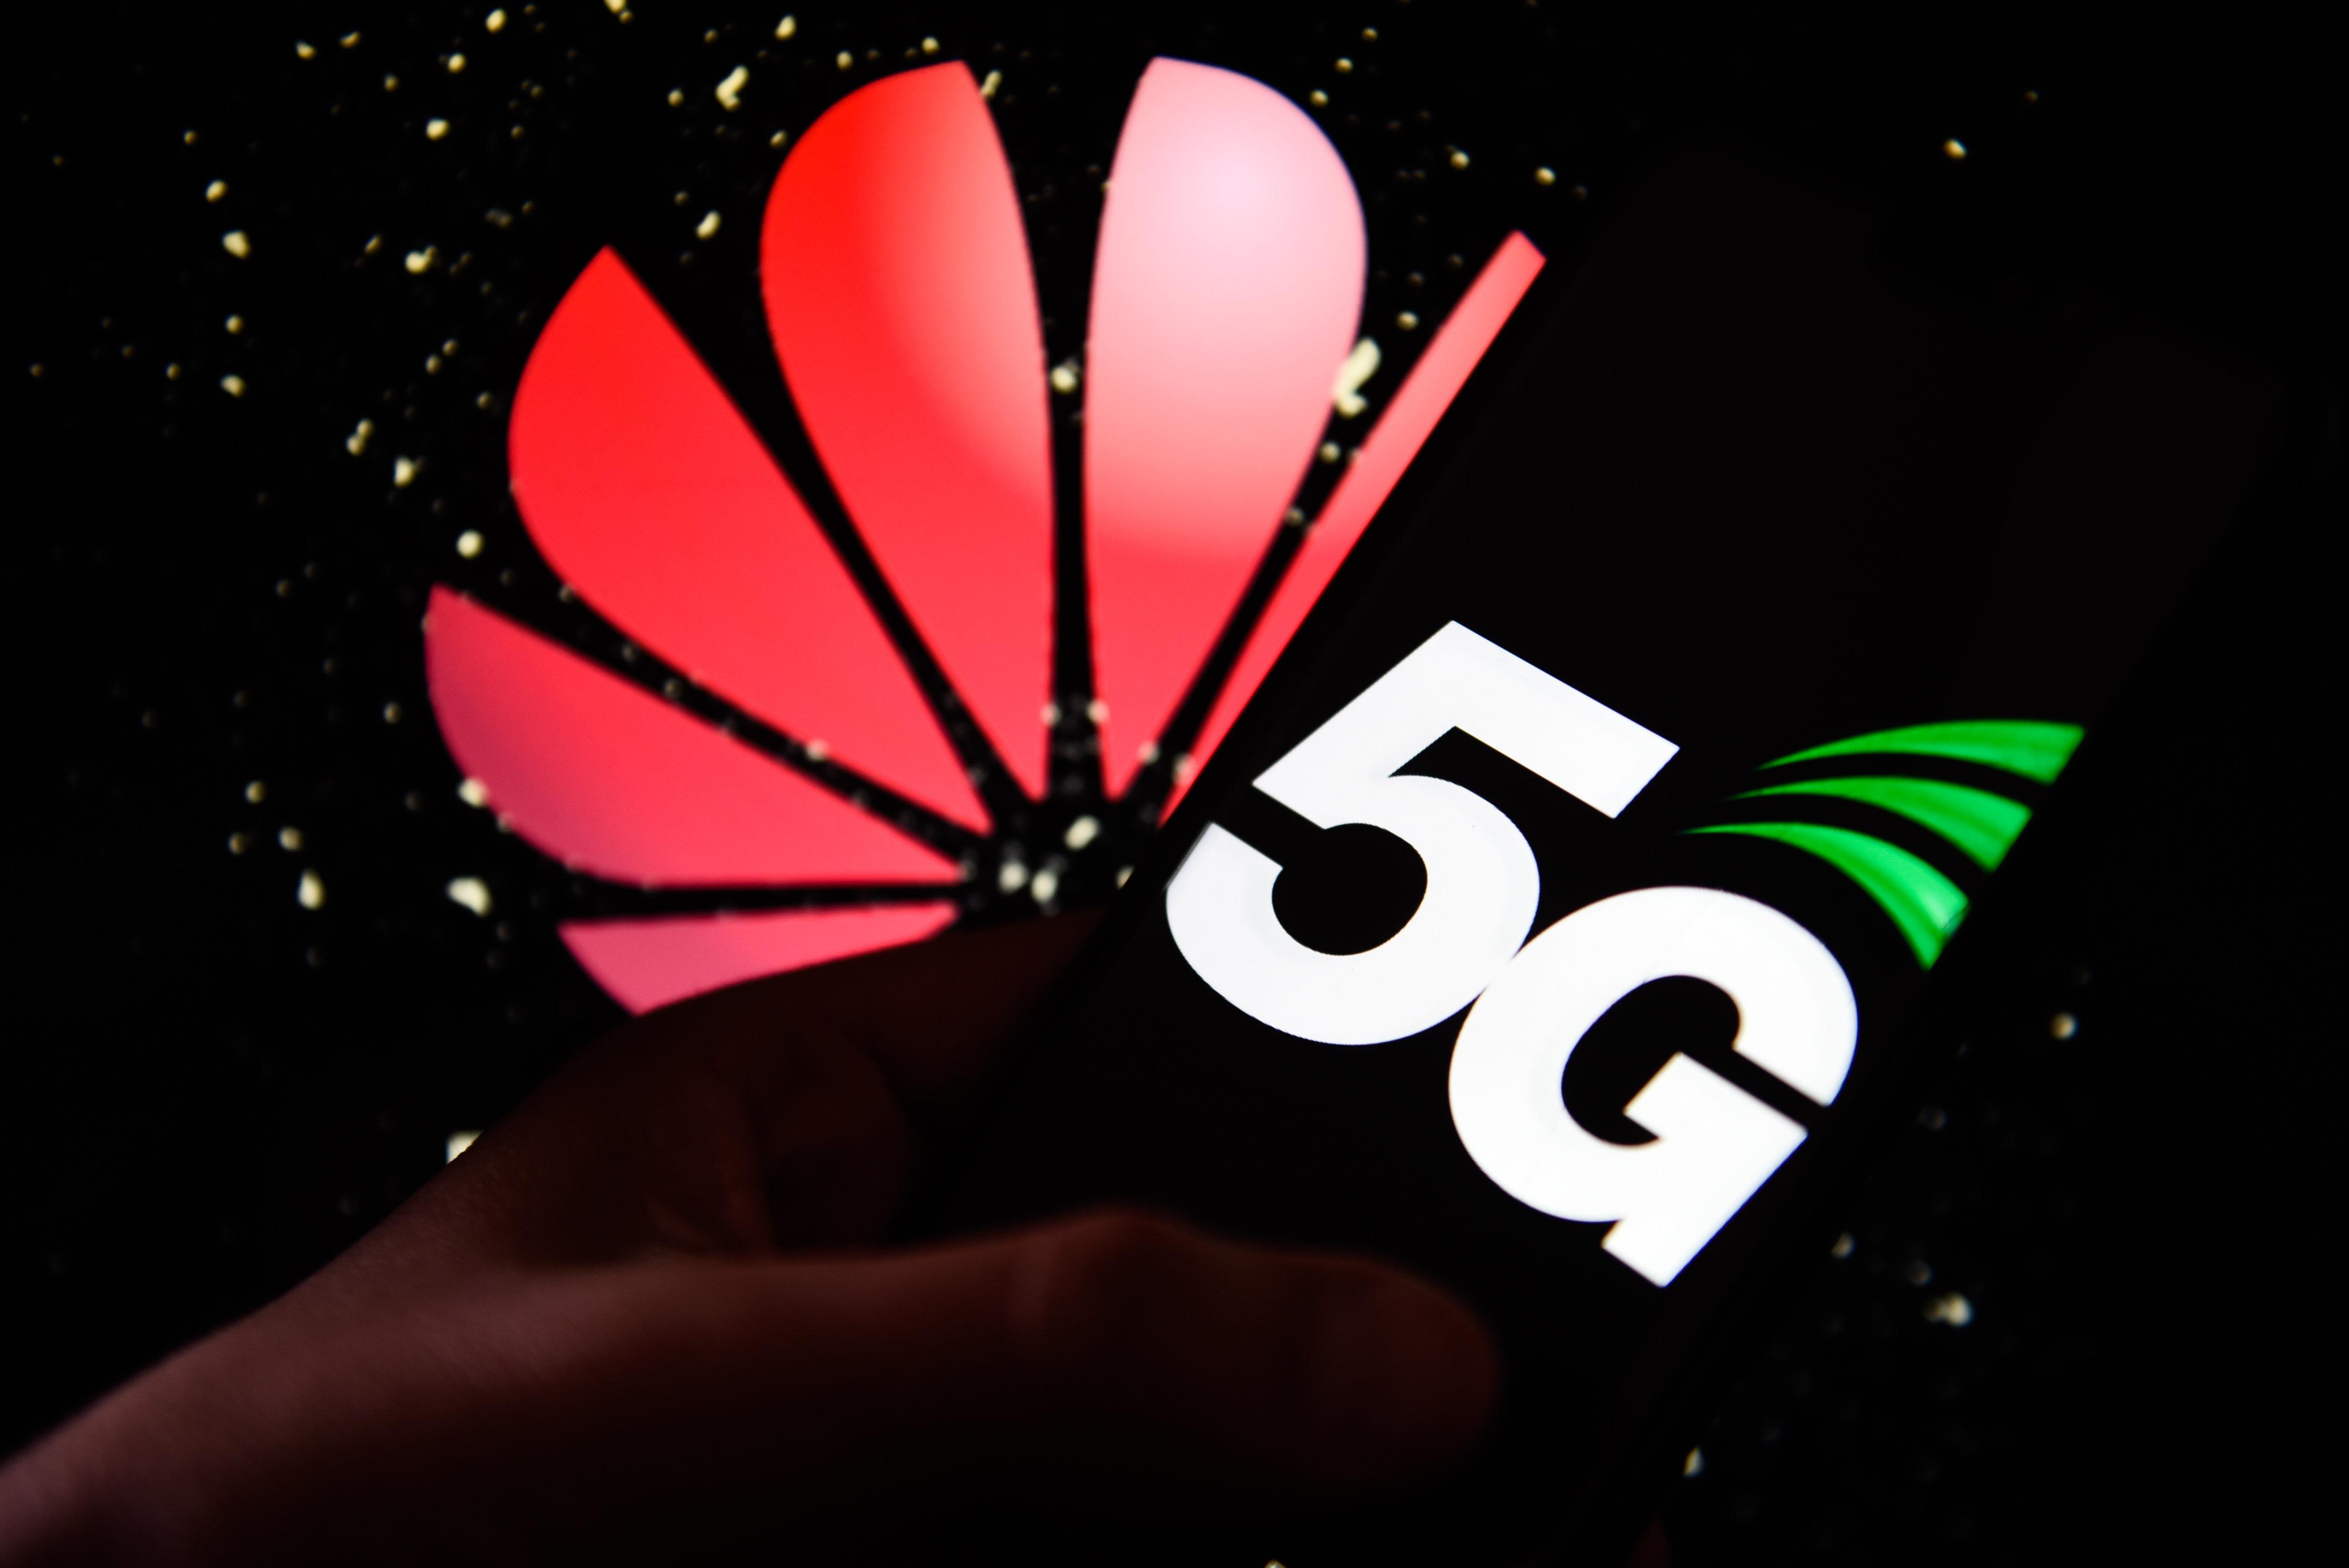 EU는 미국과 다른 길을 간다. 화웨이 5G 통신장비 금지는